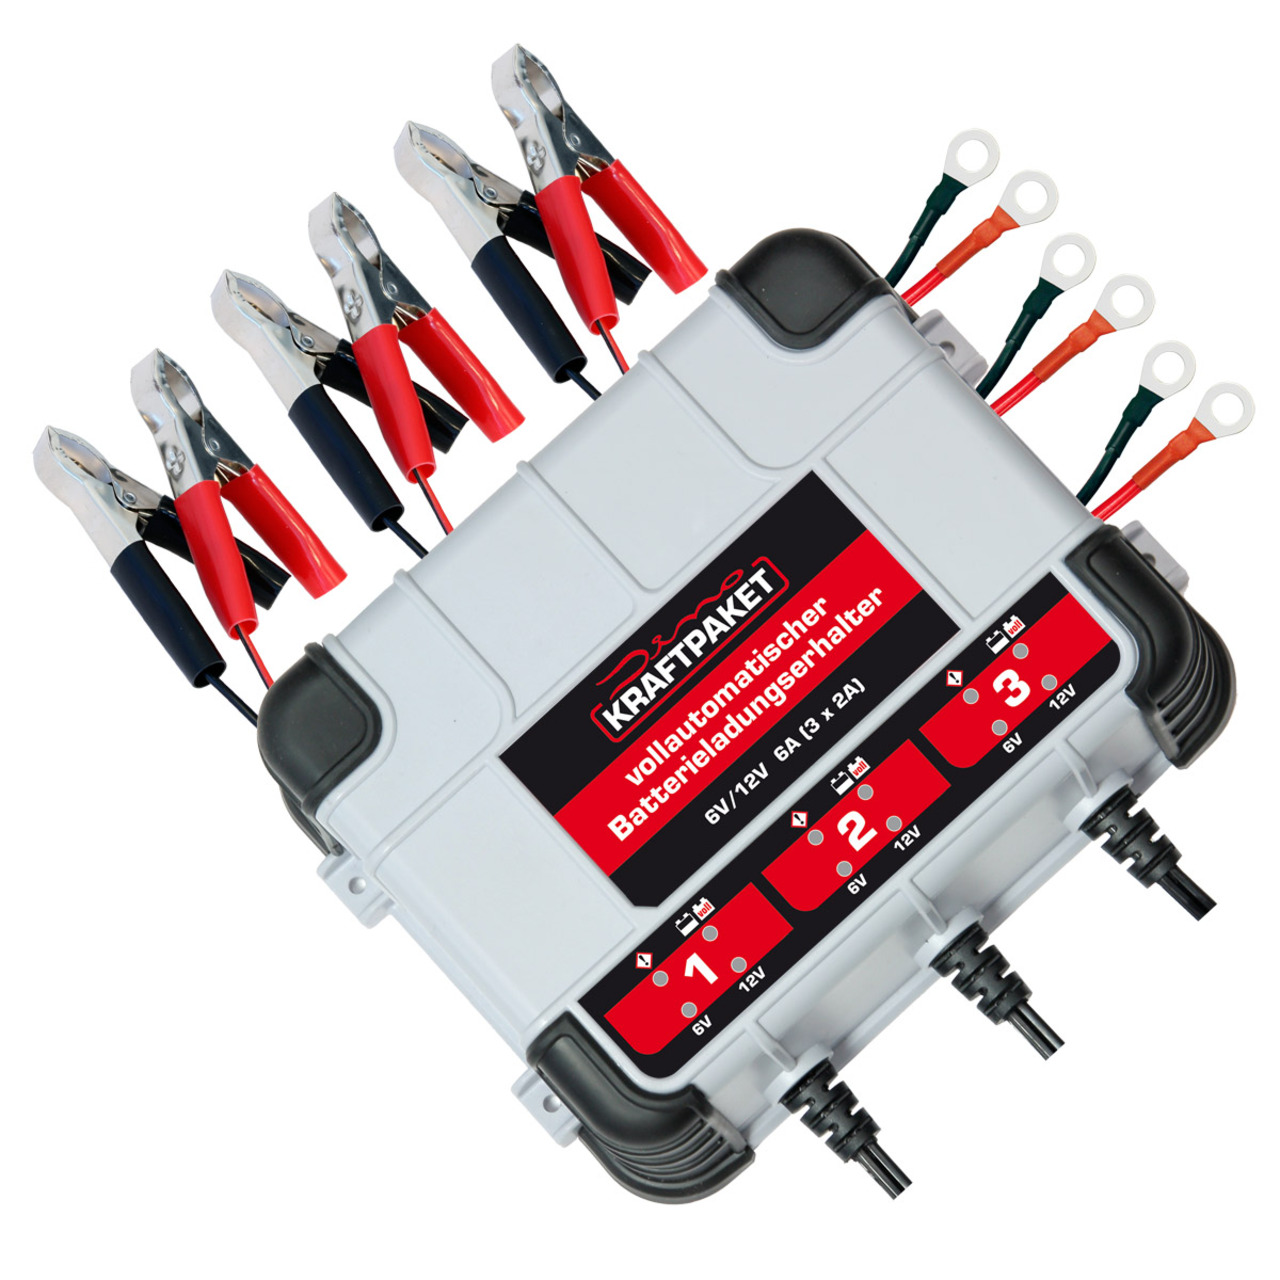 Dino KRAFTPAKET Kfz-Batterie-Erhaltungsladegerät 6V-12V 3x 2A